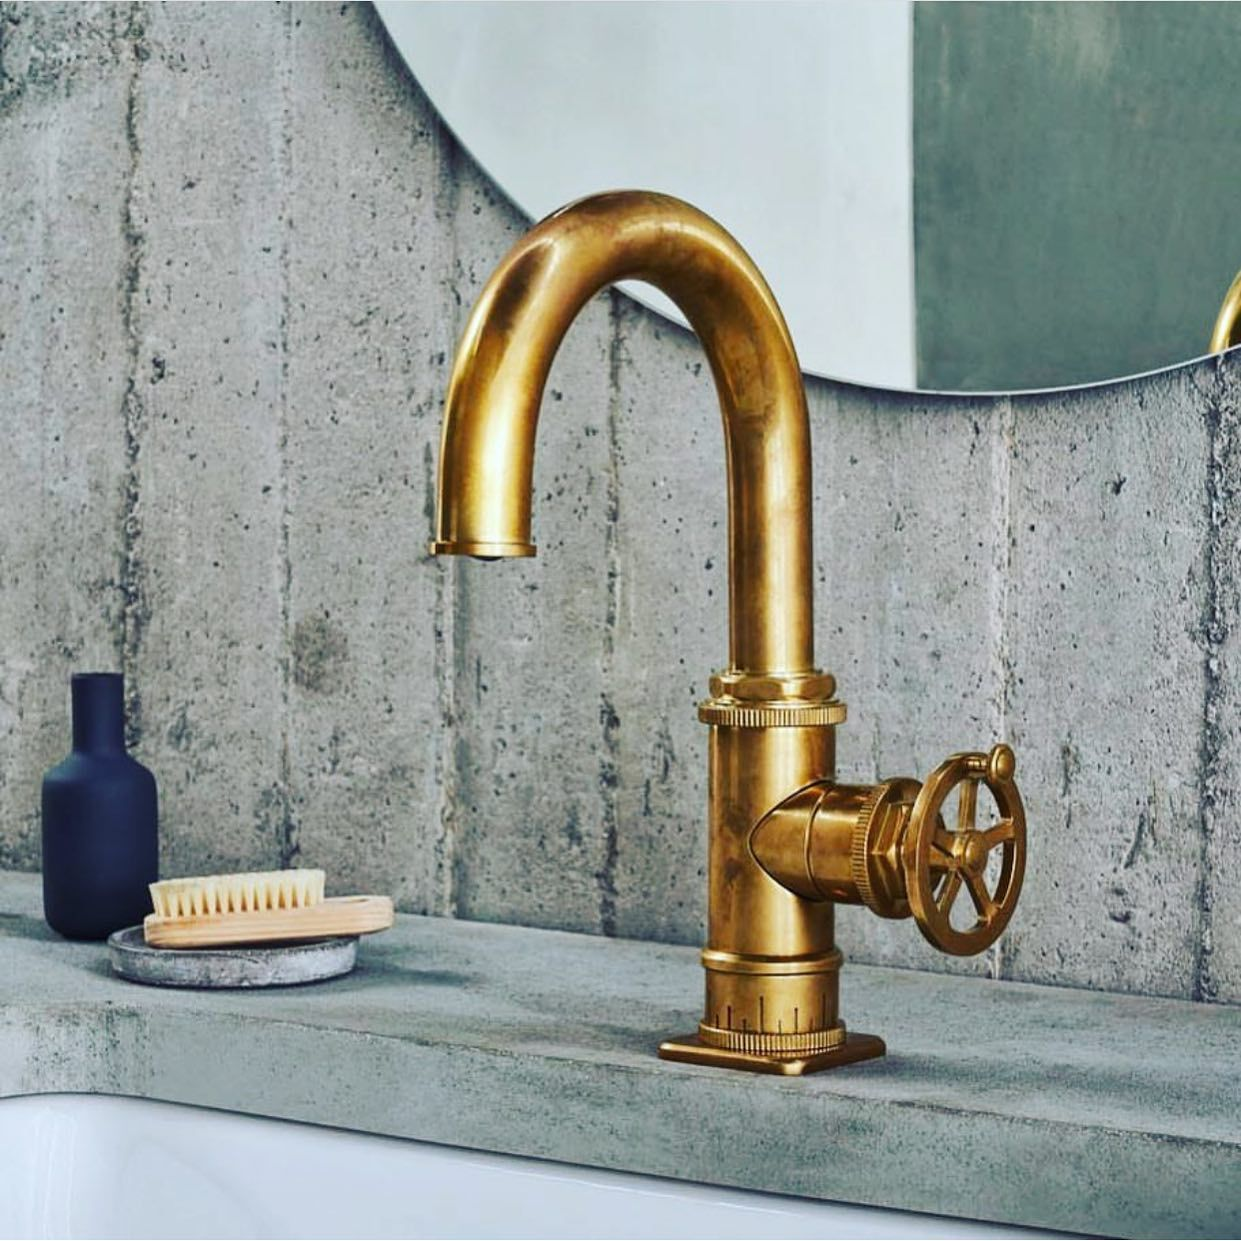 Steampunk Gold Faucet Bathroomdetails Designerdetails